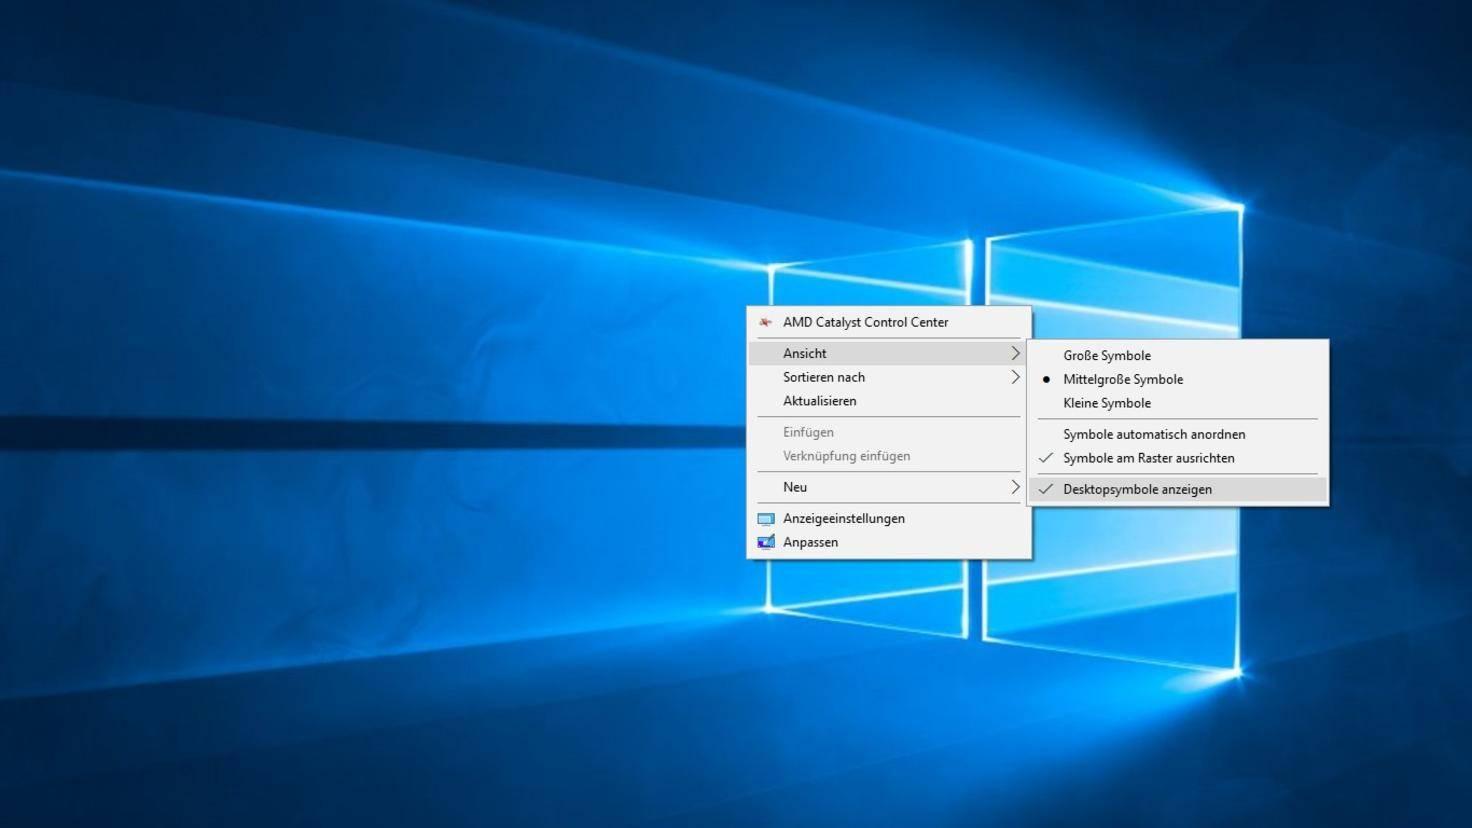 Windows 10 Desktopsymbole ausblenden